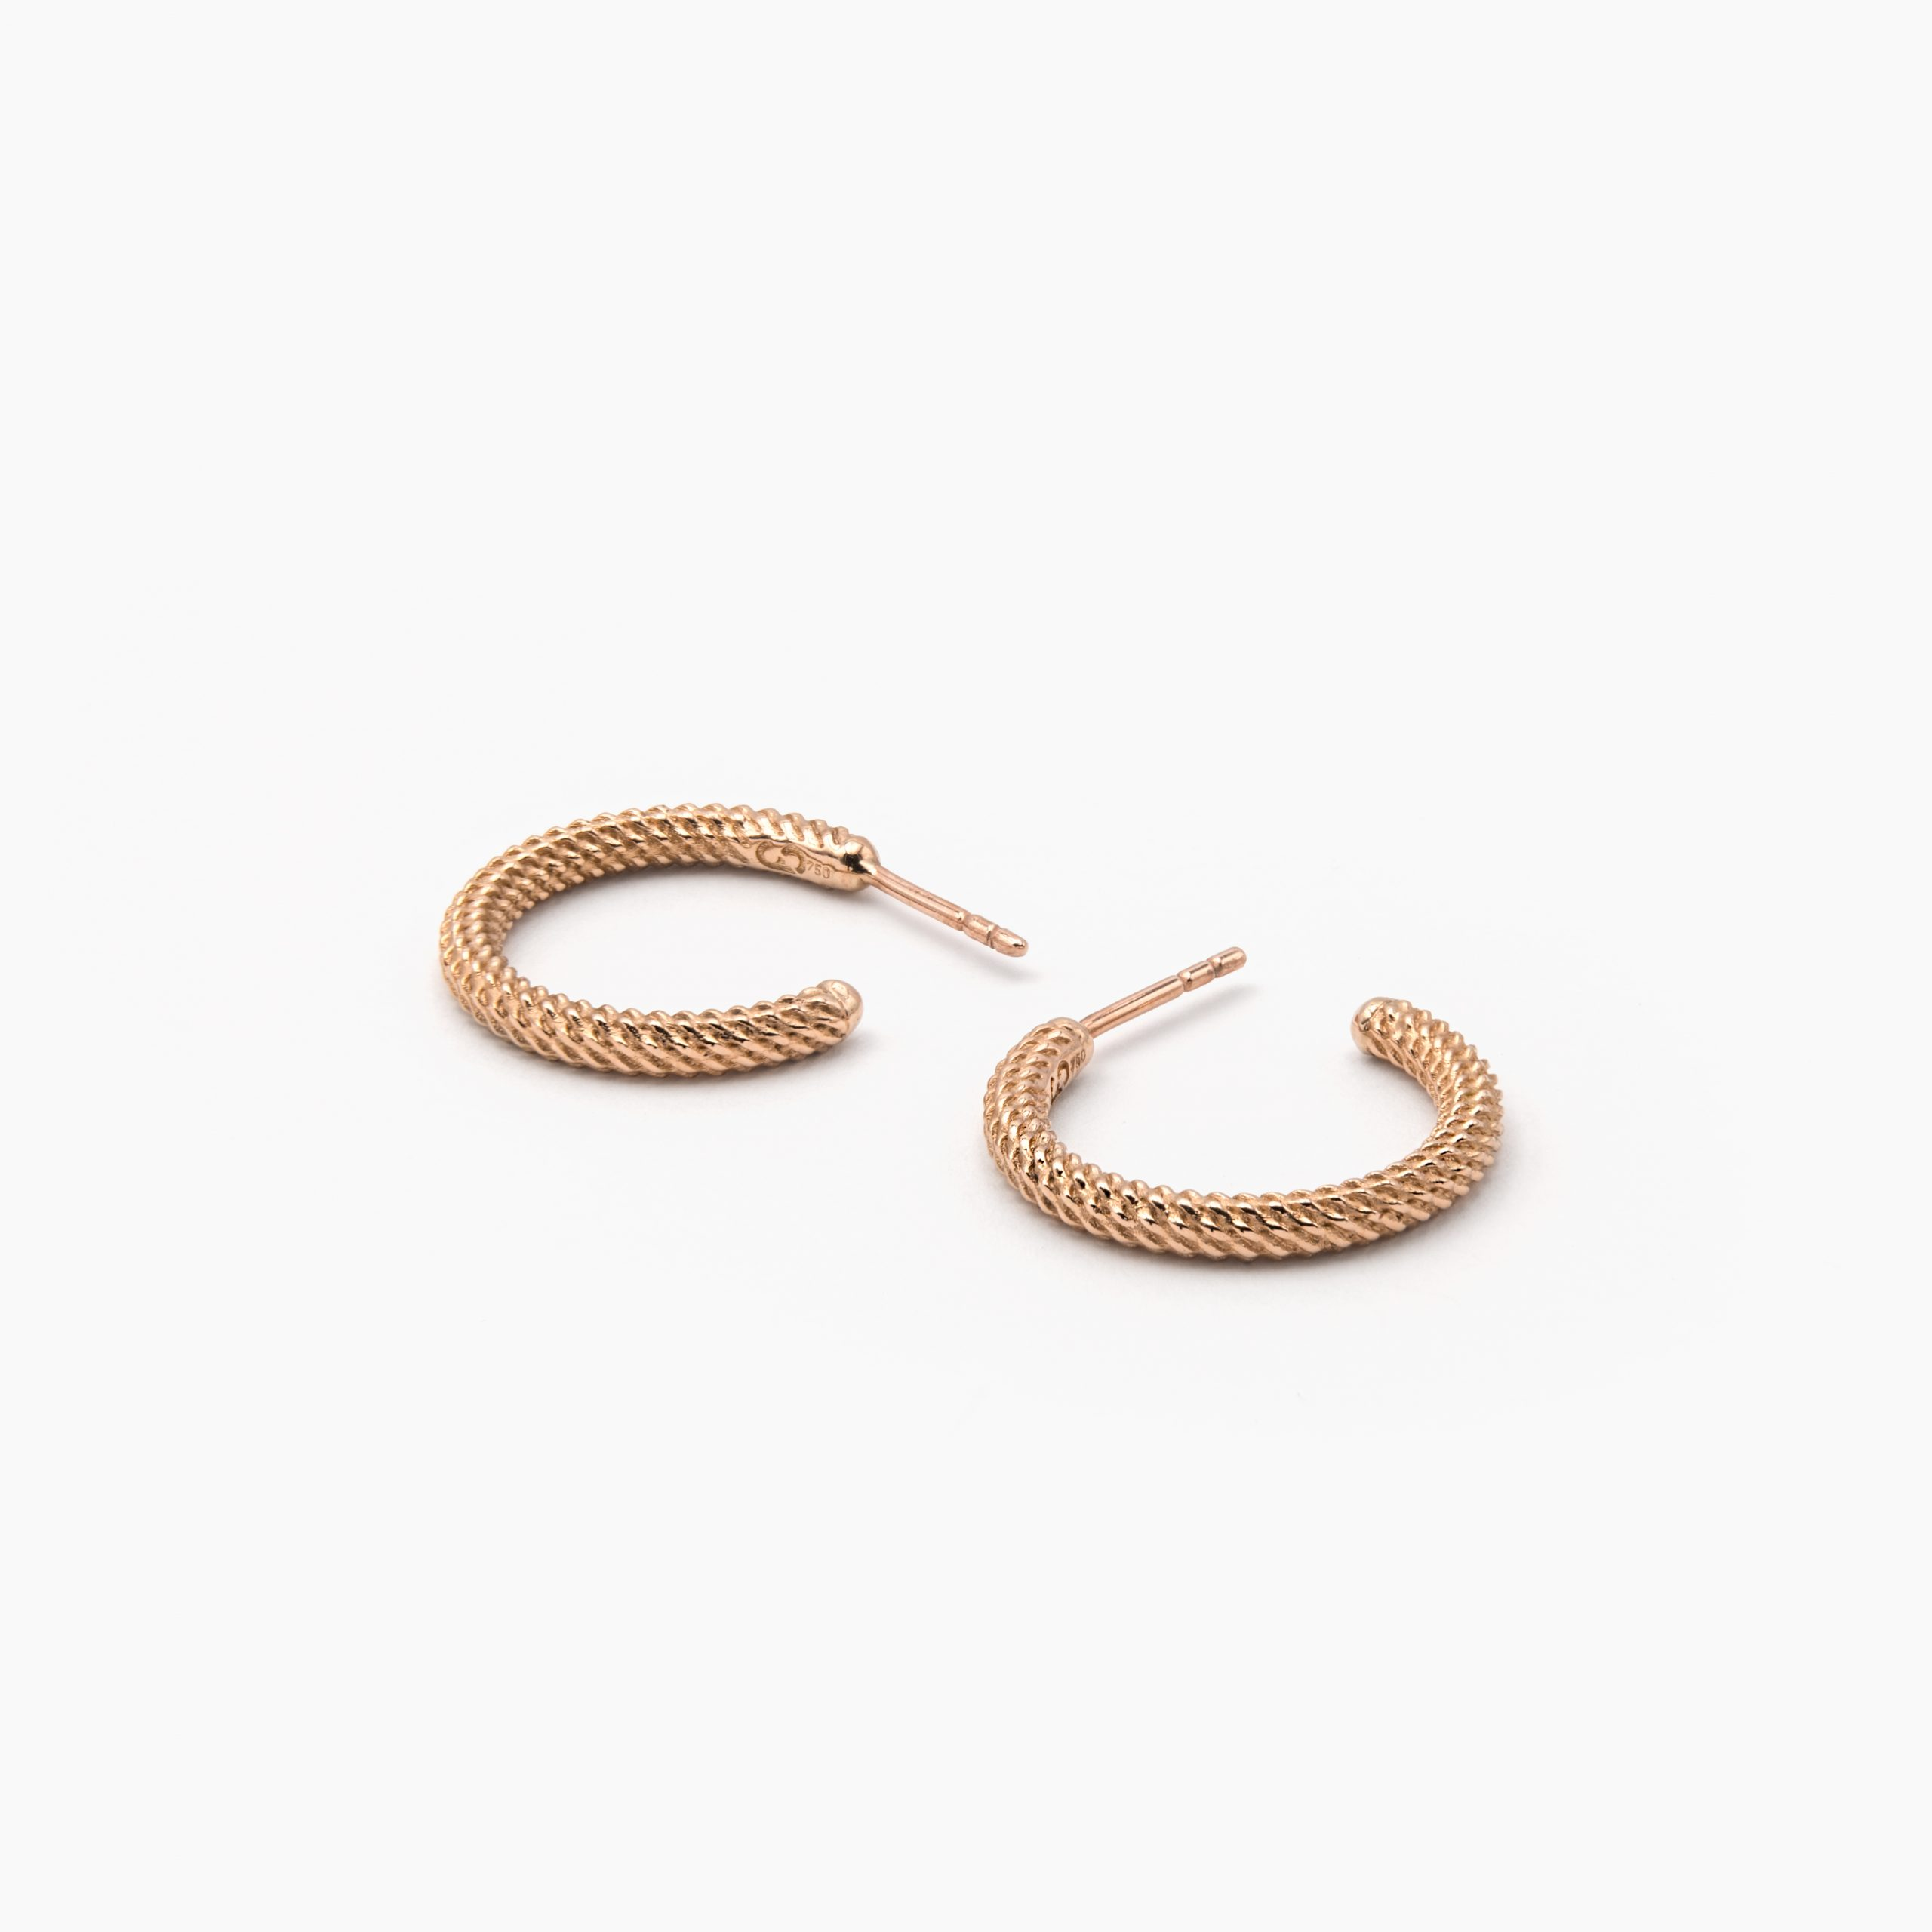 SIAN_Nio_Earring-Creole-Ohrring